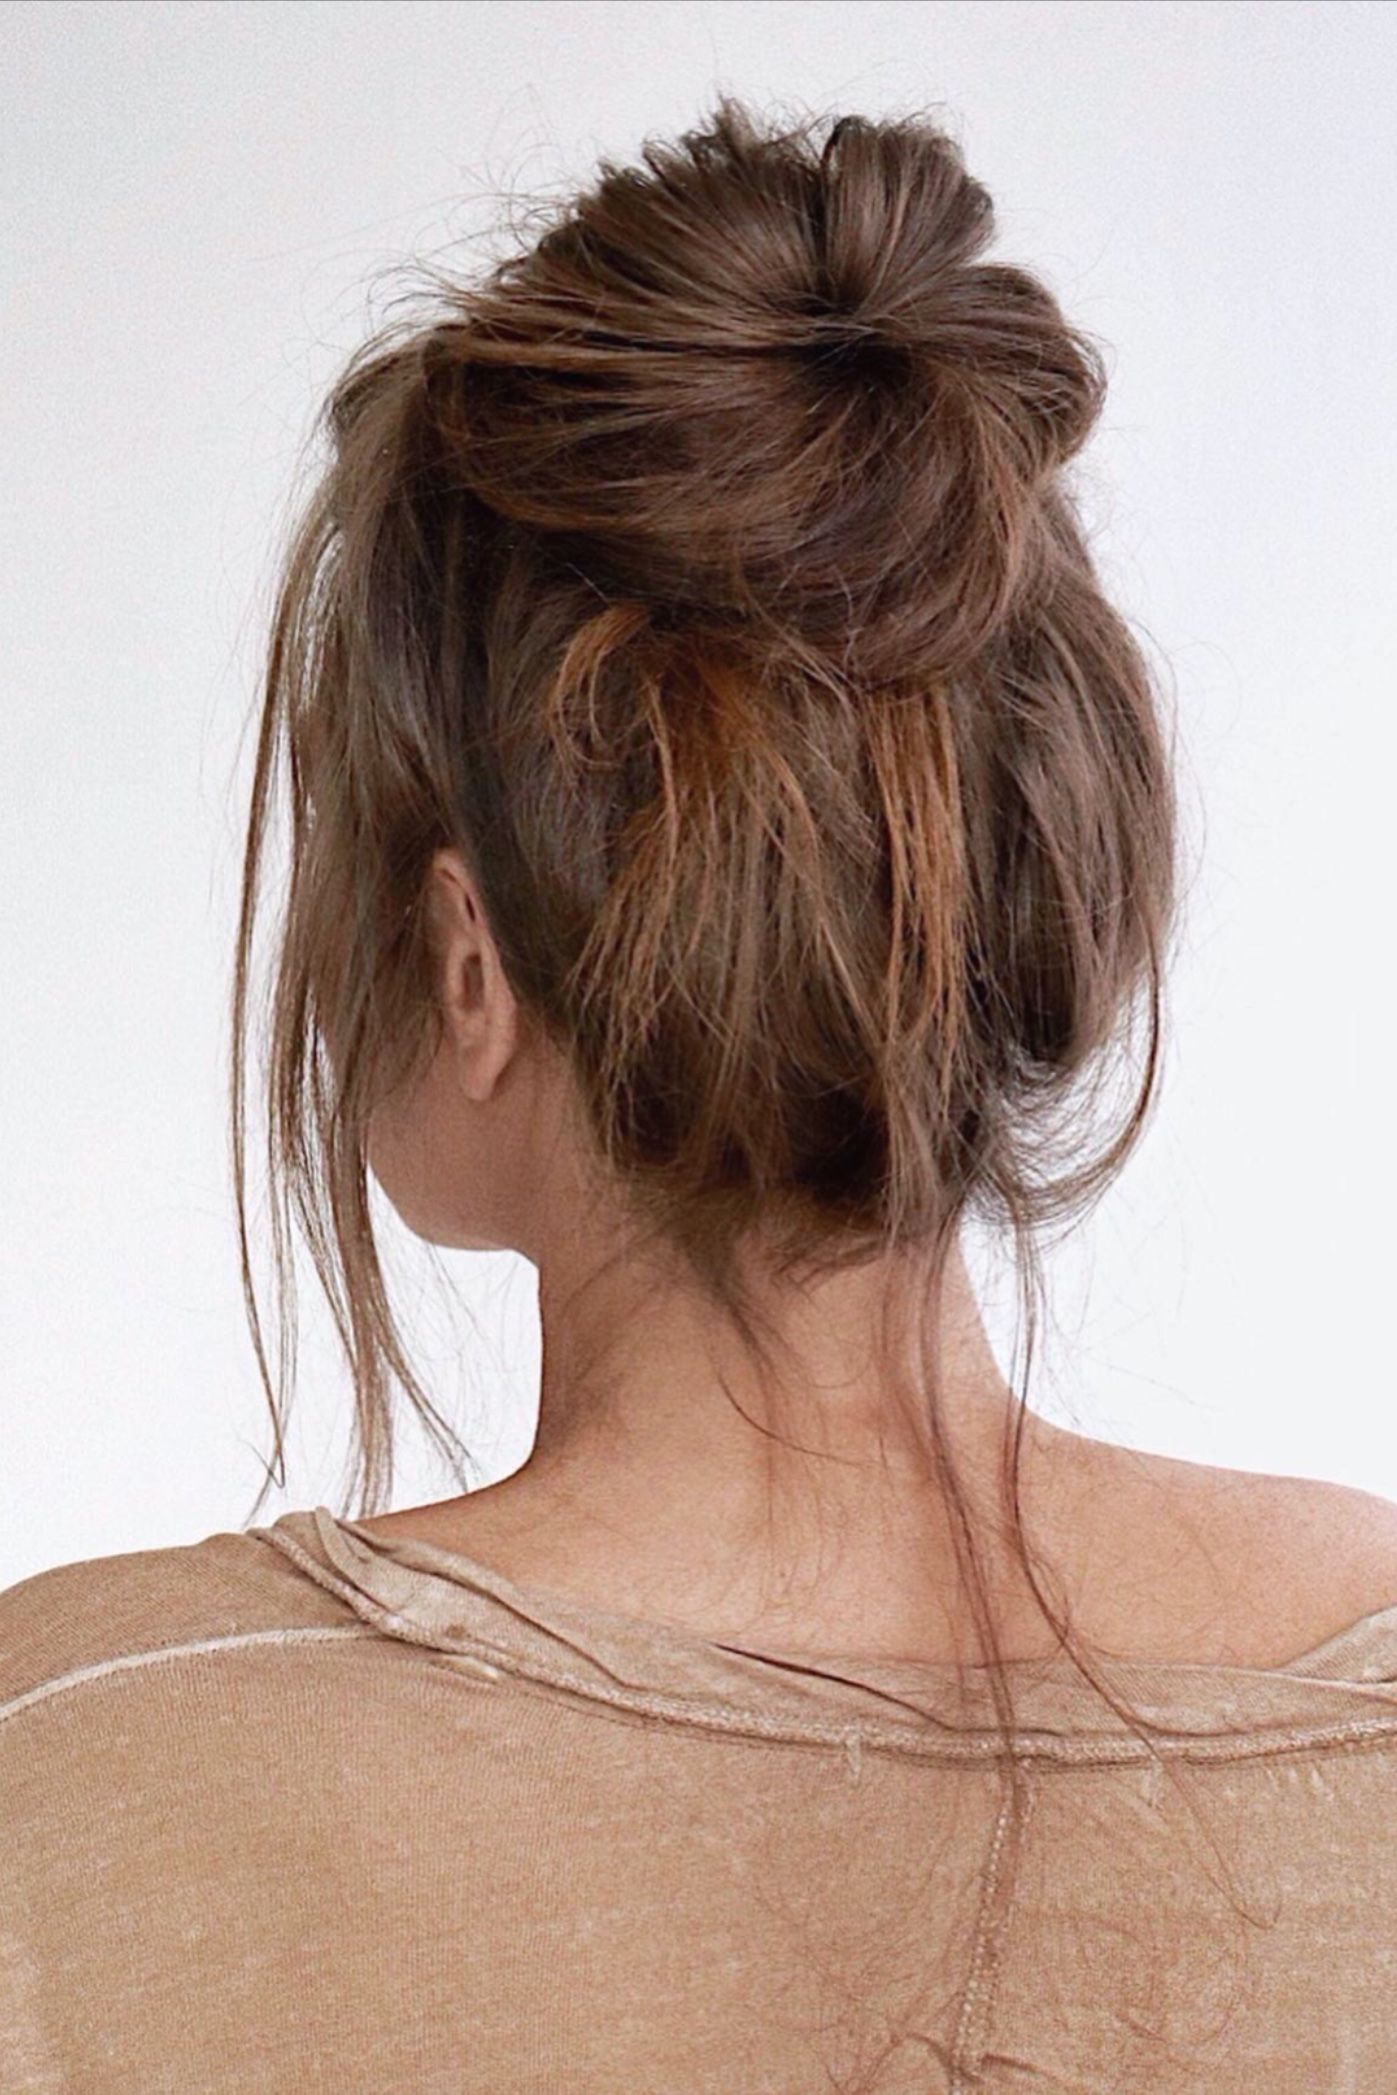 Tumblr Messy Bun Everyday Hairstyles In 2020 Brown Hair Messy Bun Hair Bun Tutorial Cute Up Hairstyles